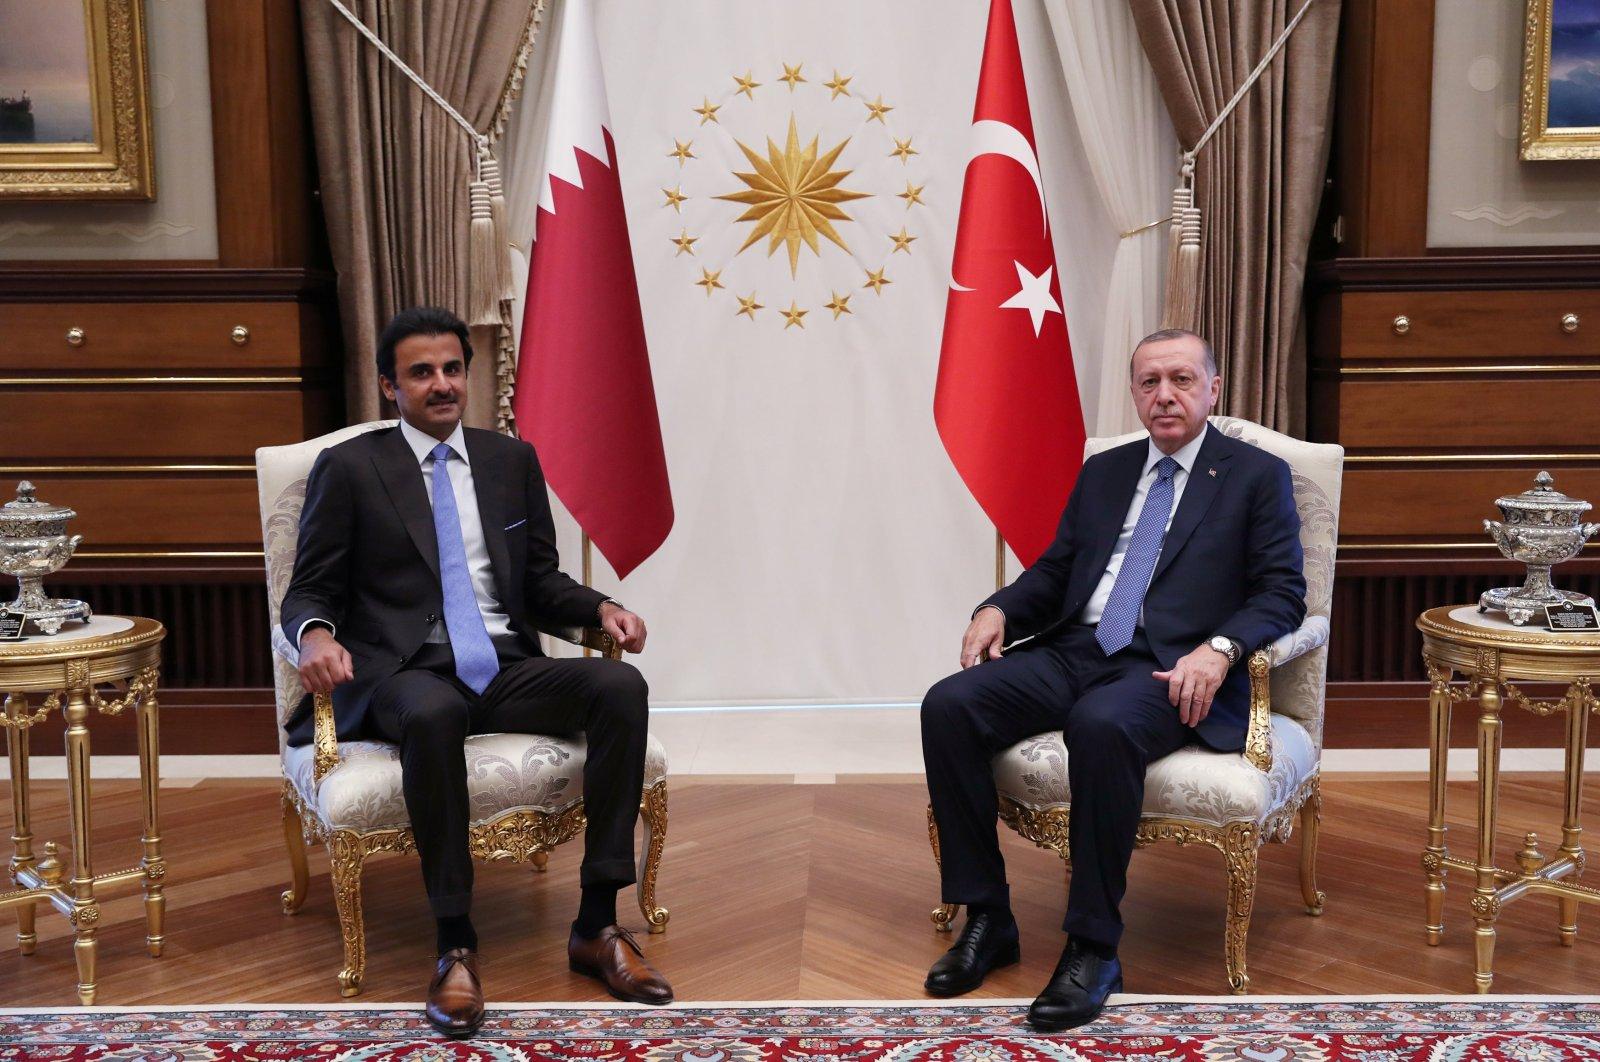 Turkish President Recep Tayyip Erdoğan meets with Qatari Emir Sheikh Tamim Bin Hamad Al Thani in Ankara, Turkey, Aug. 15, 2018. (Reuters Photo)